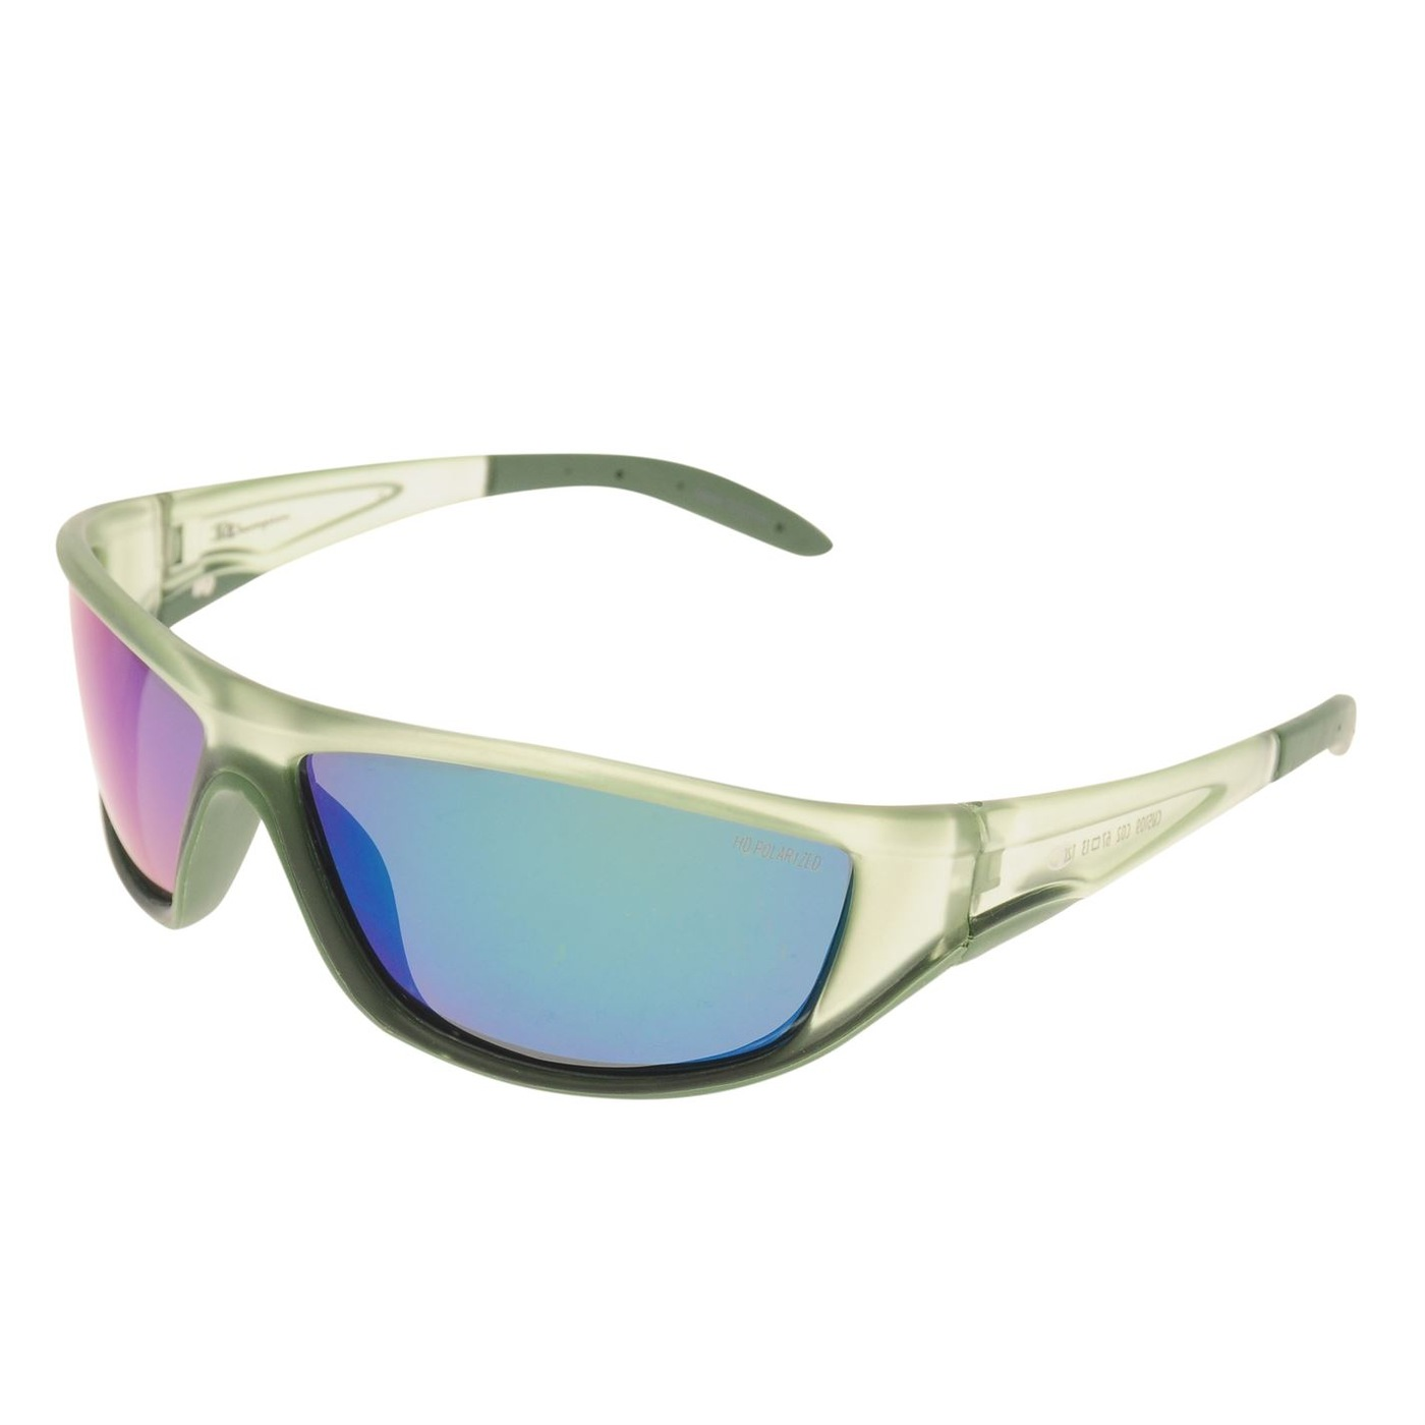 Champion cu5109 sunglasses mens levně | Mobilmania zboží